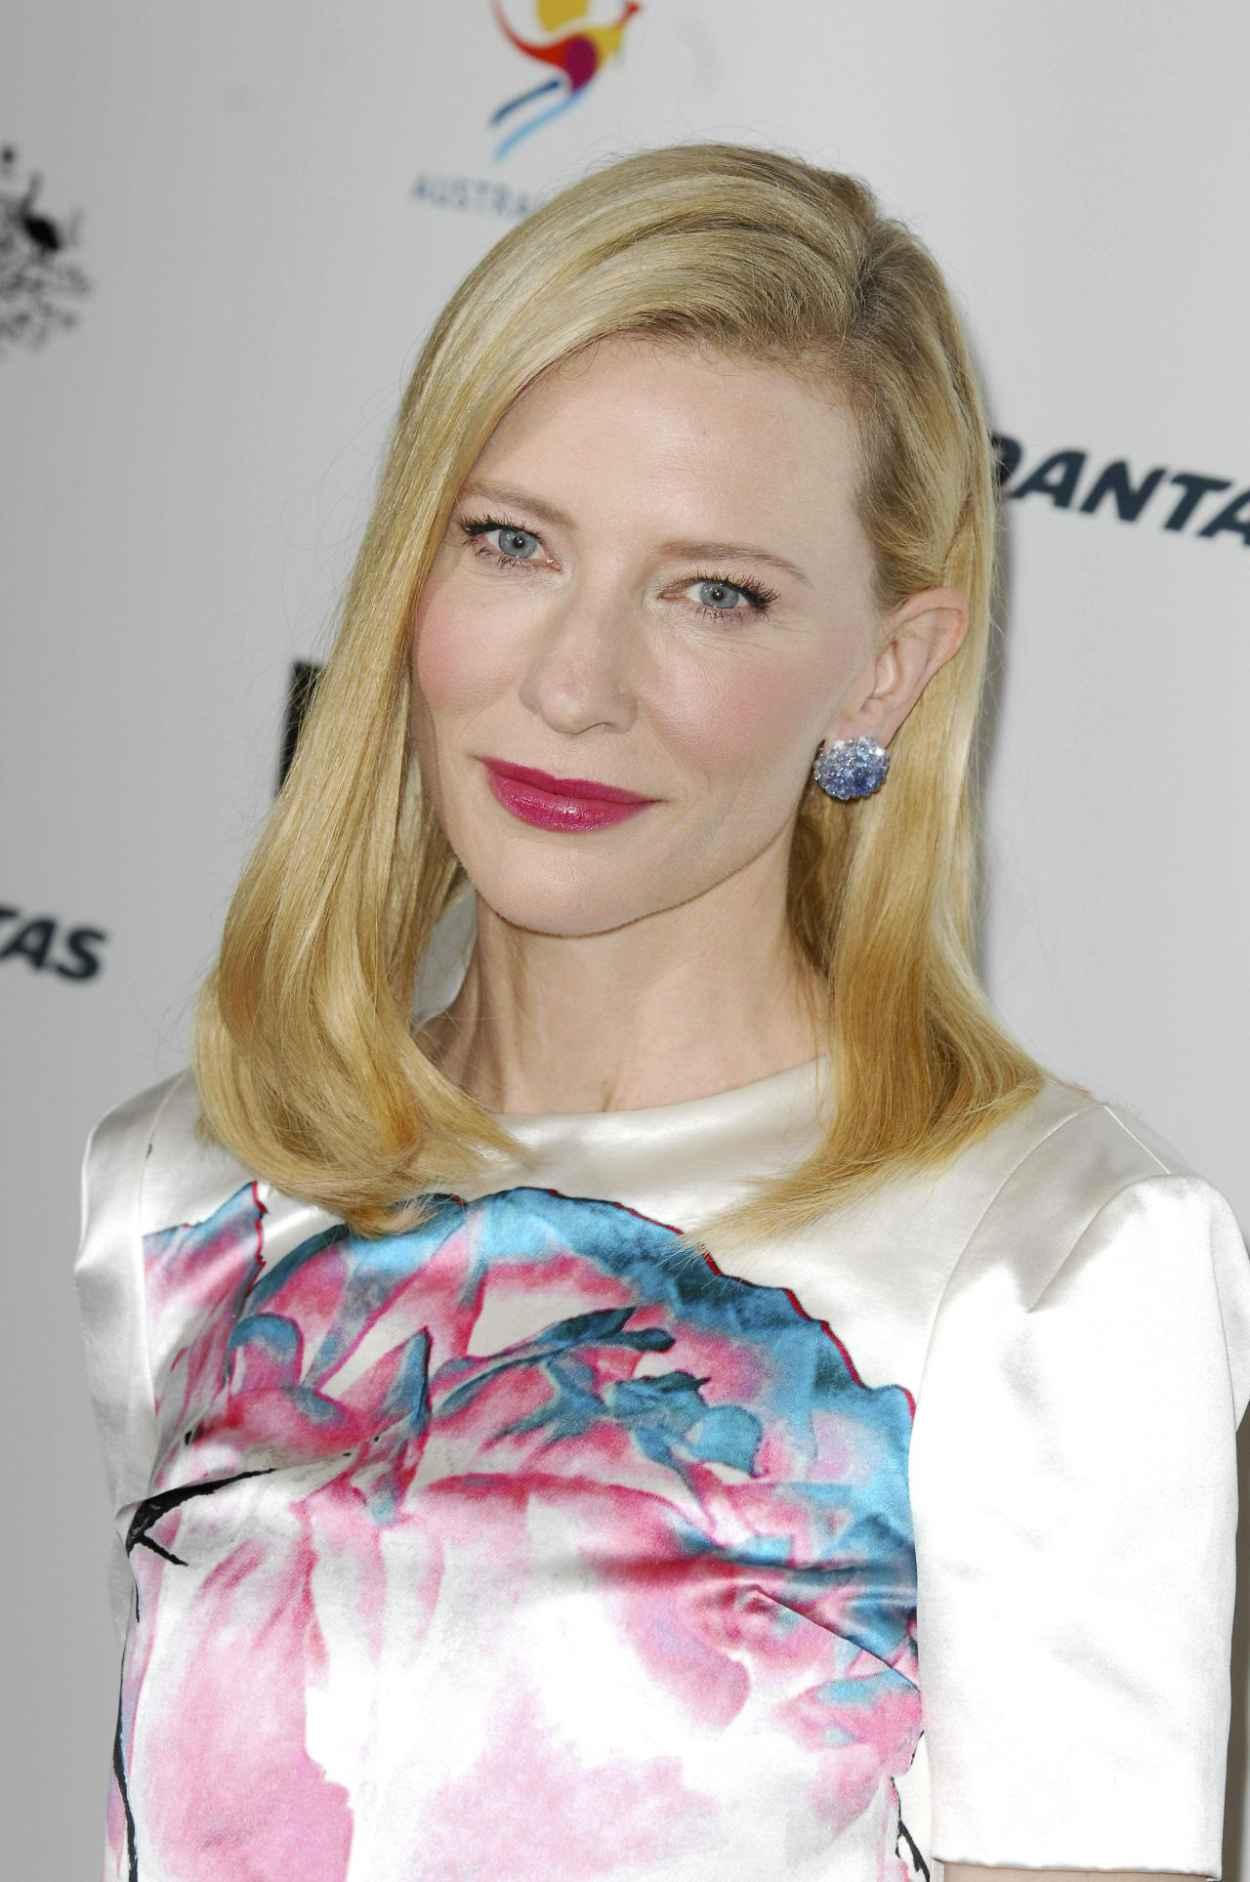 Cate Blanchett Wears Prabal Gurung at GDay USA L.A. Black Tie Gala - January 2015-1